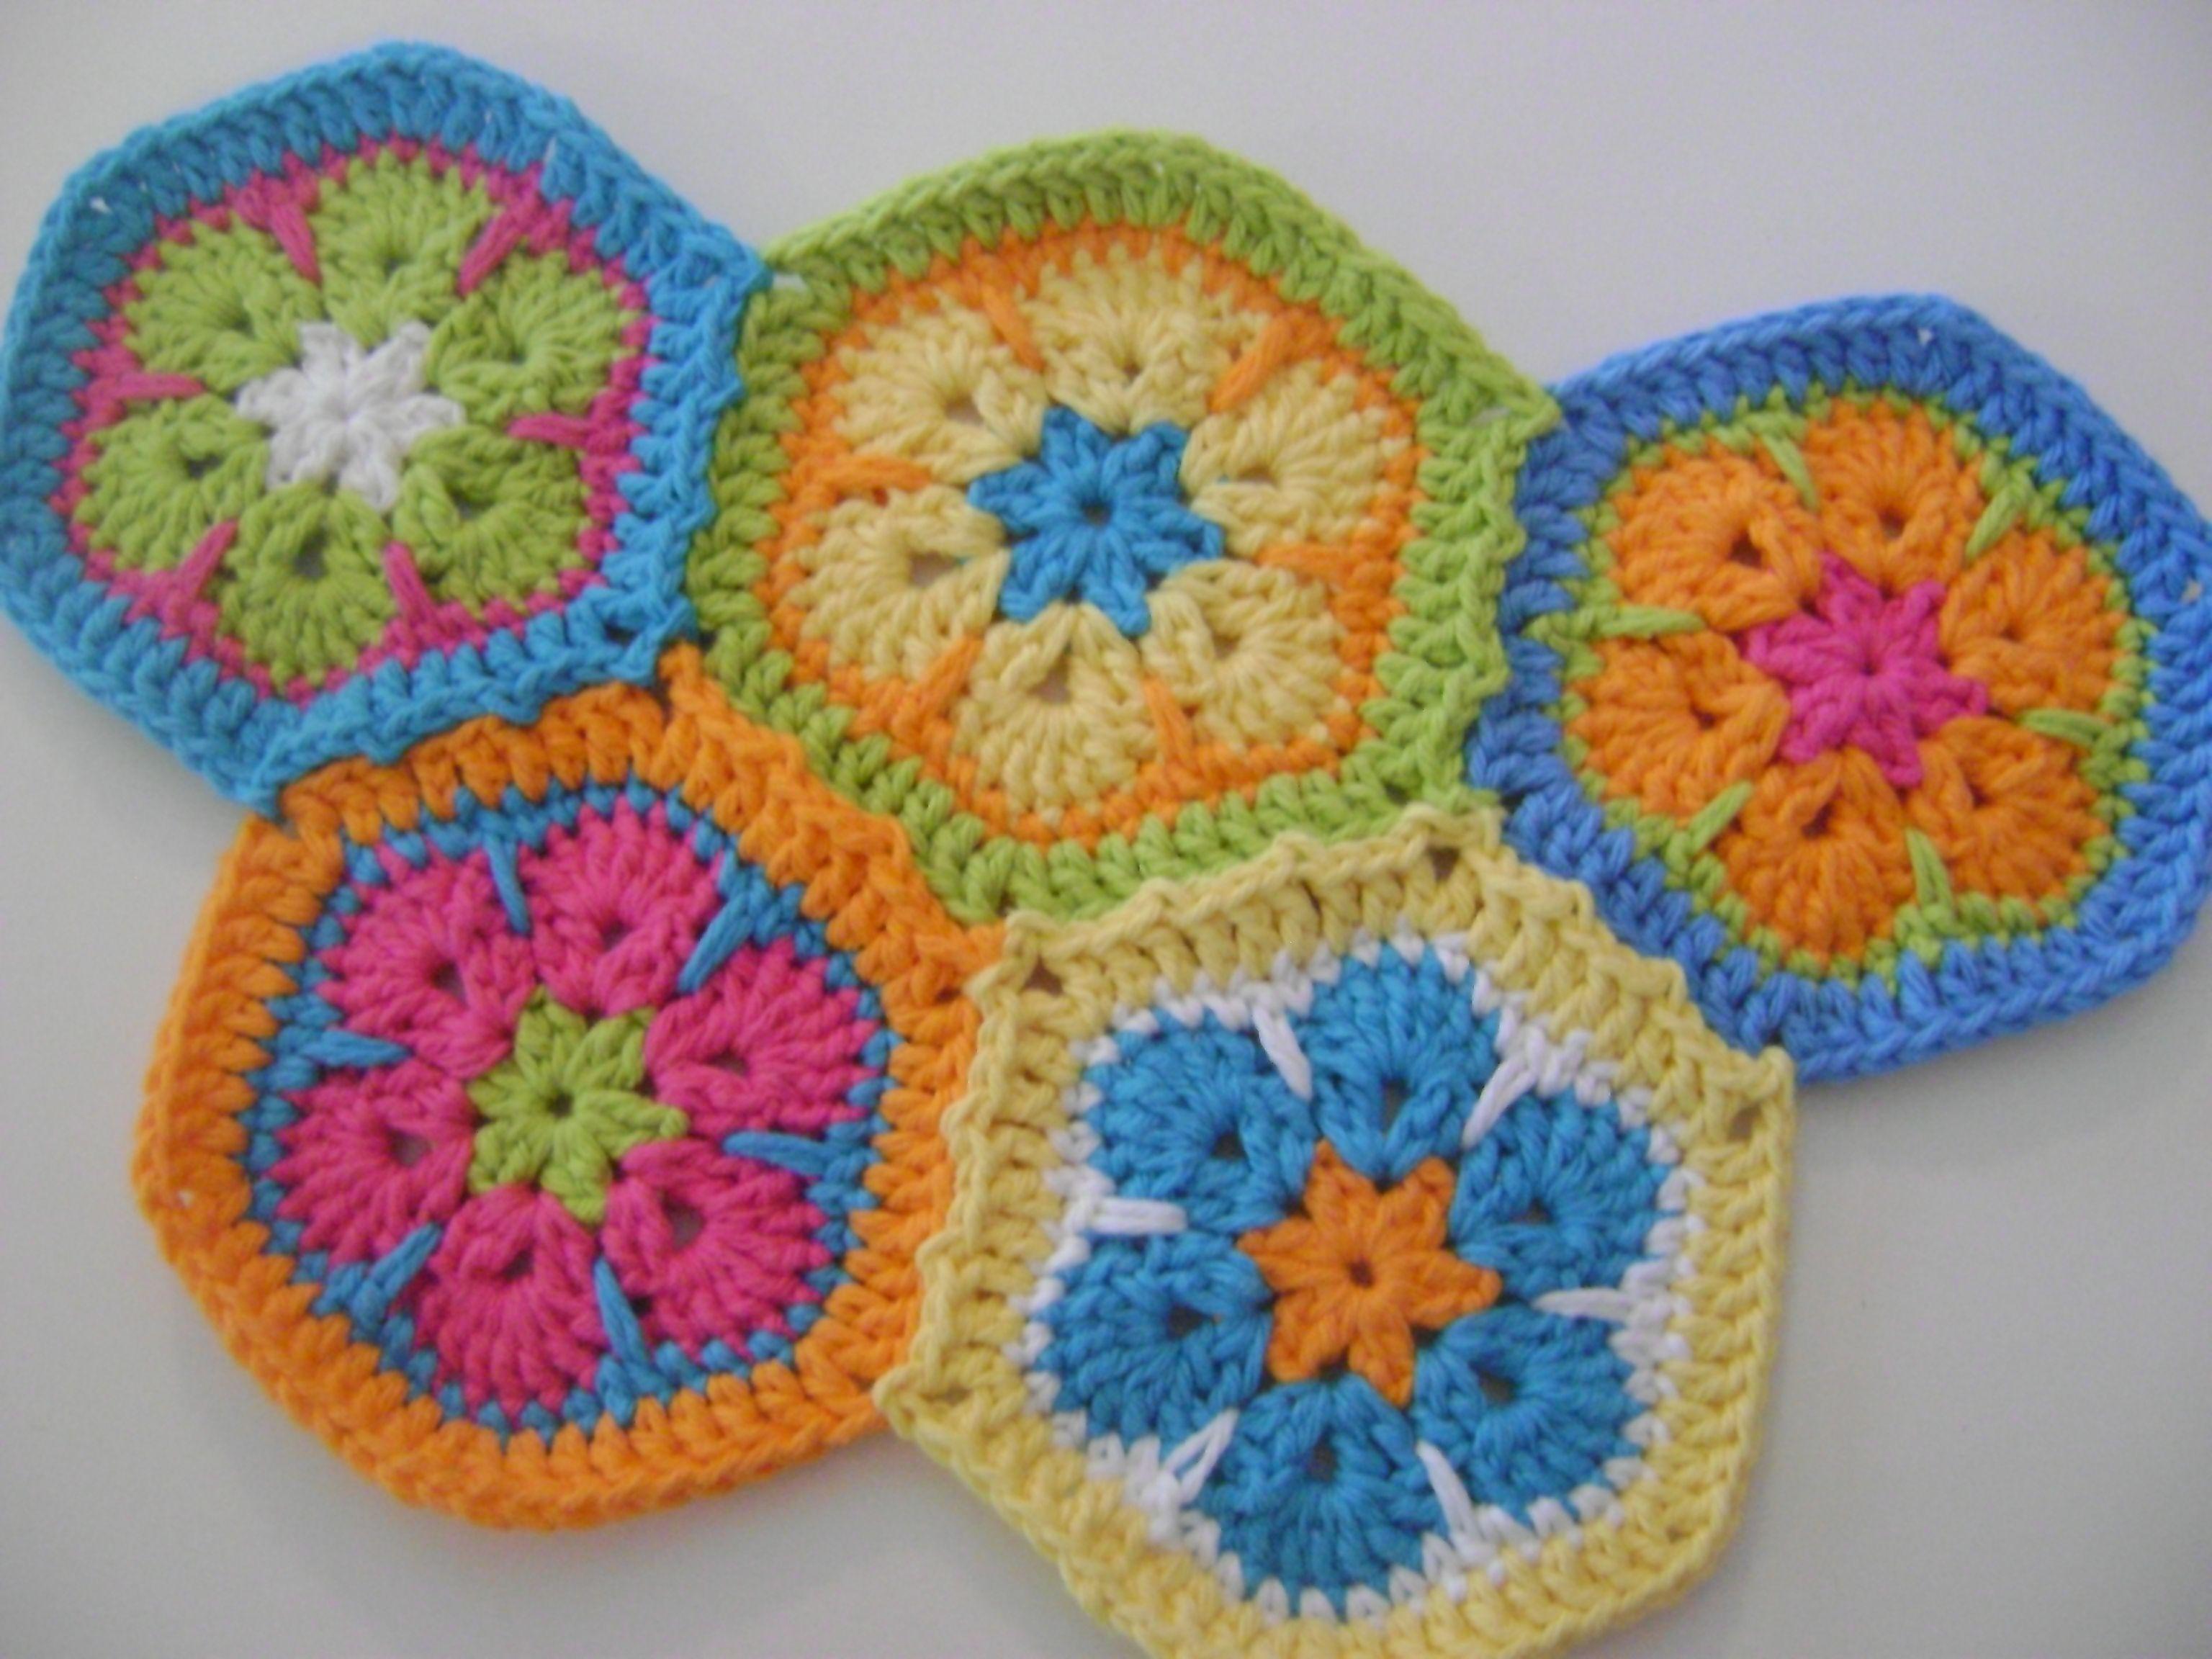 Free hexagon crochet patterns at mooglyblog blankets free hexagon crochet patterns at mooglyblog dt1010fo